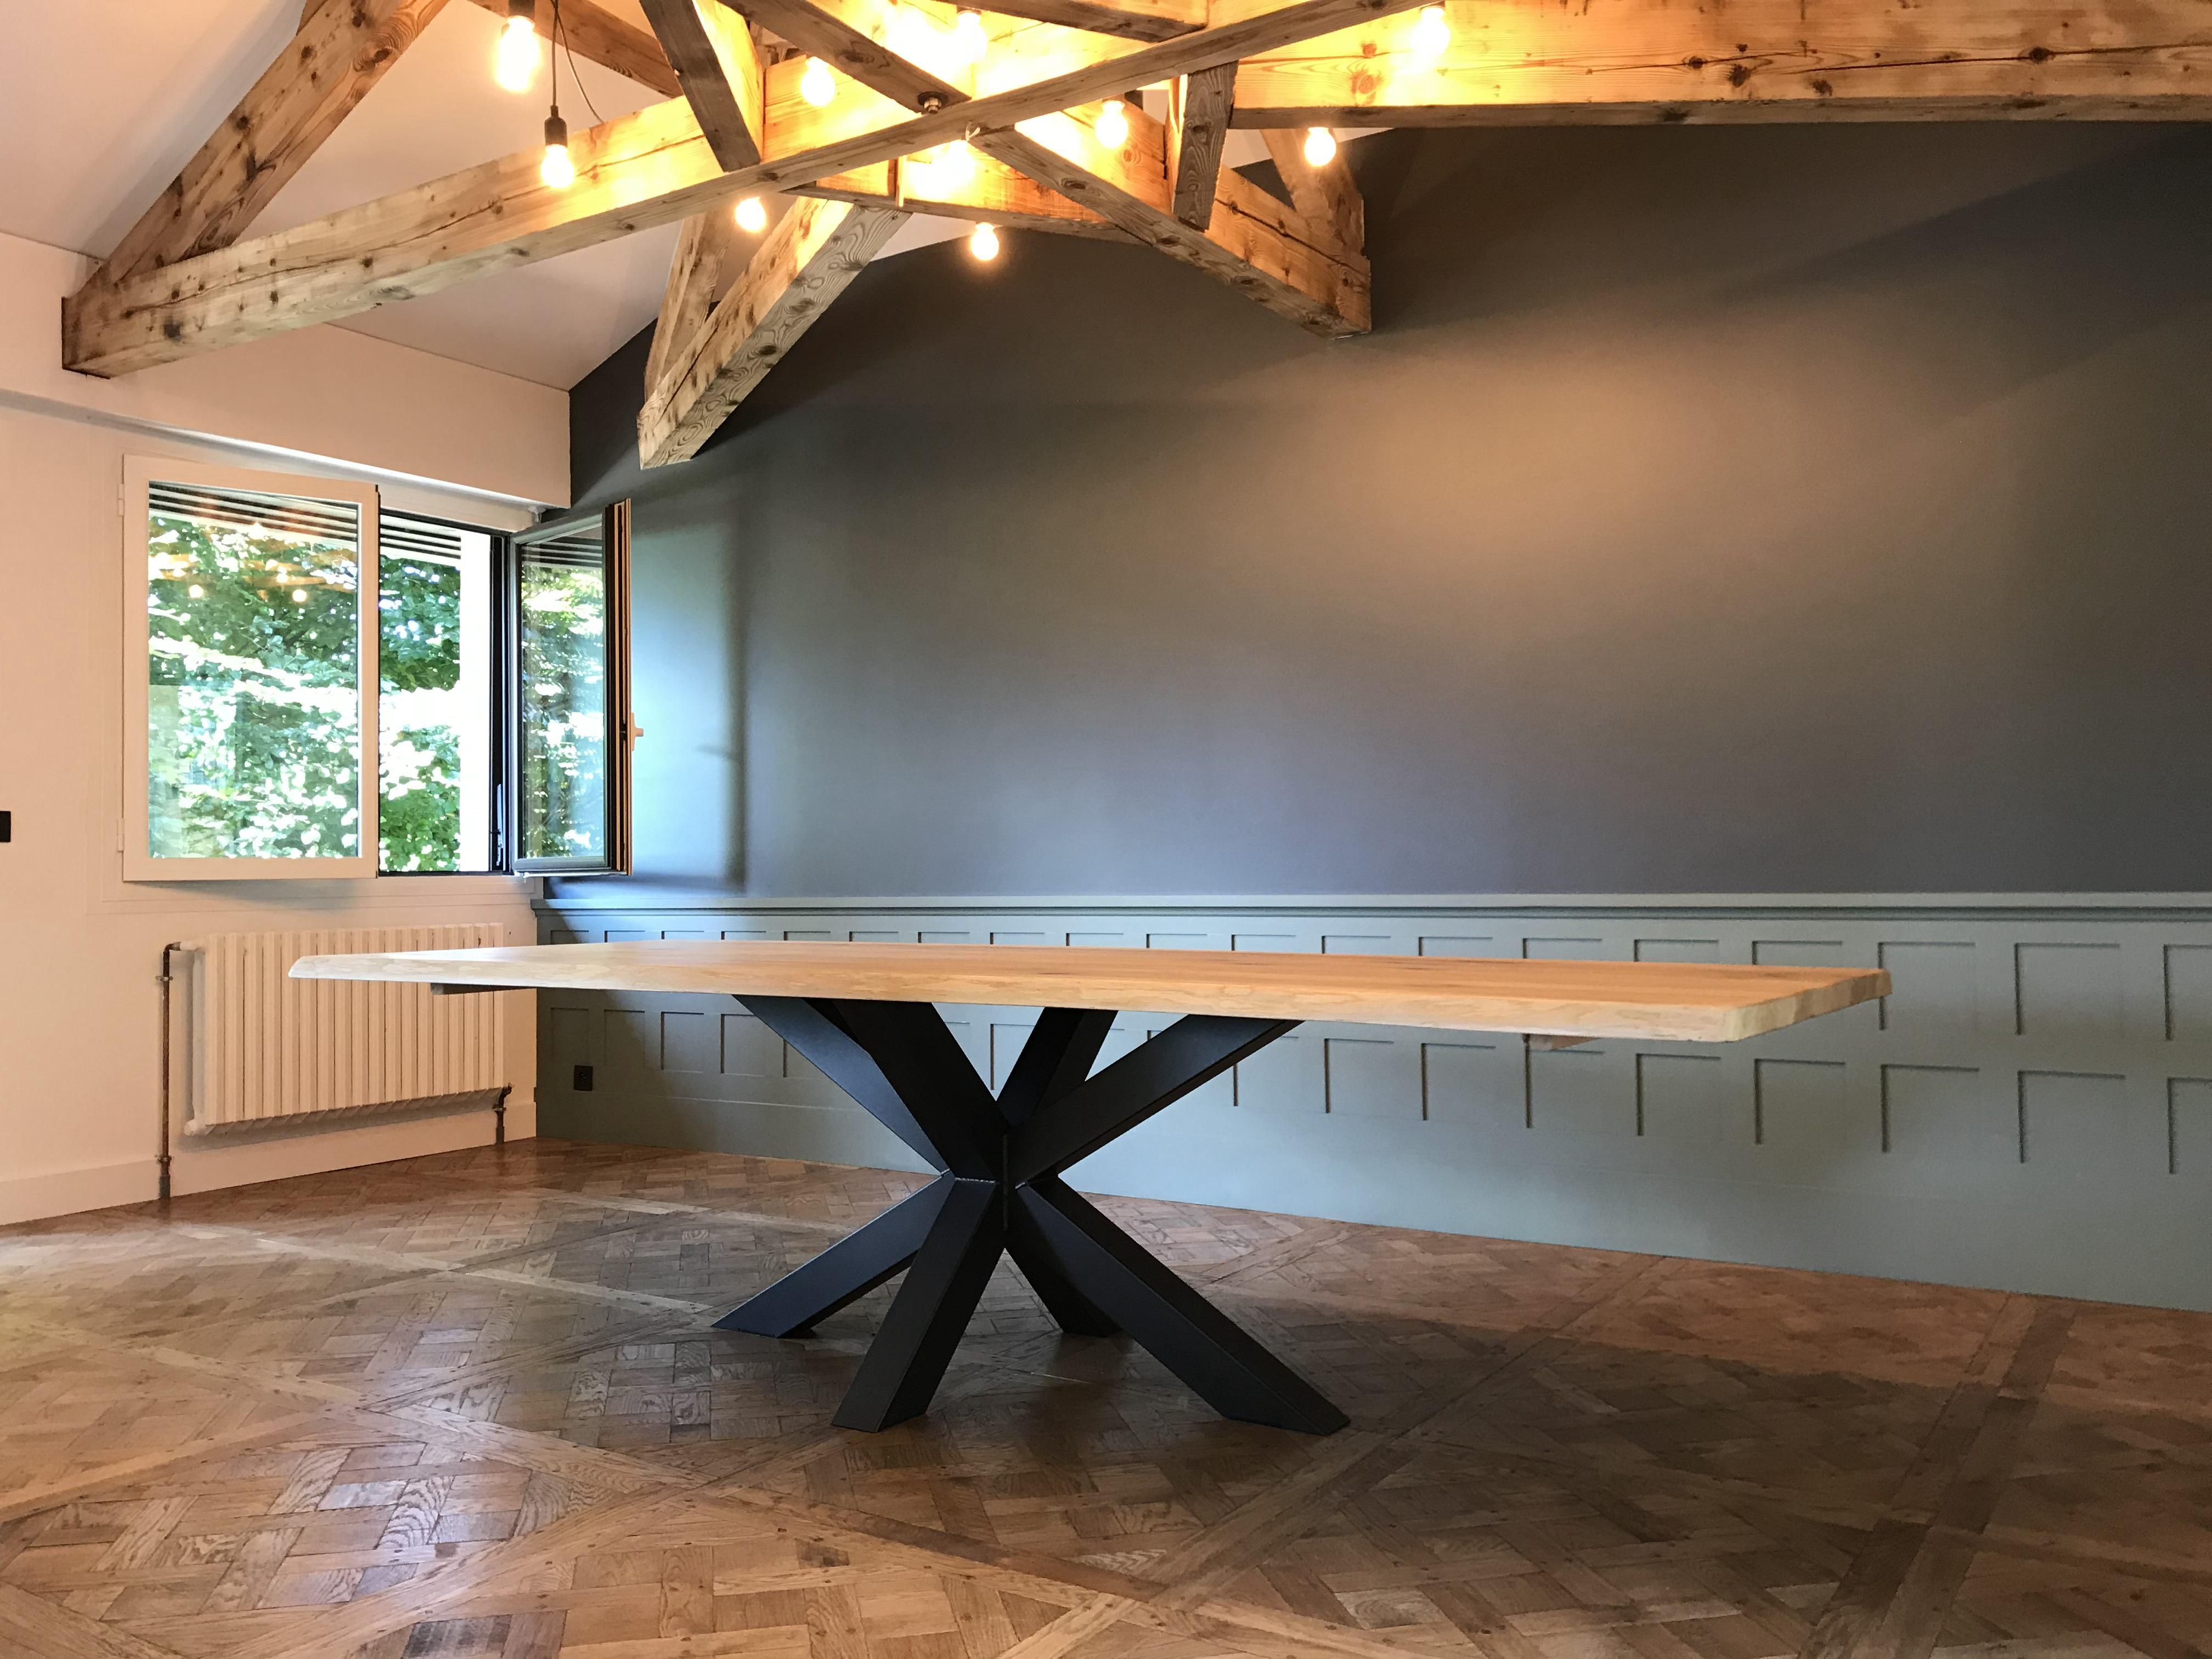 Table Bois Metal Pied Central Design Industriel Creation